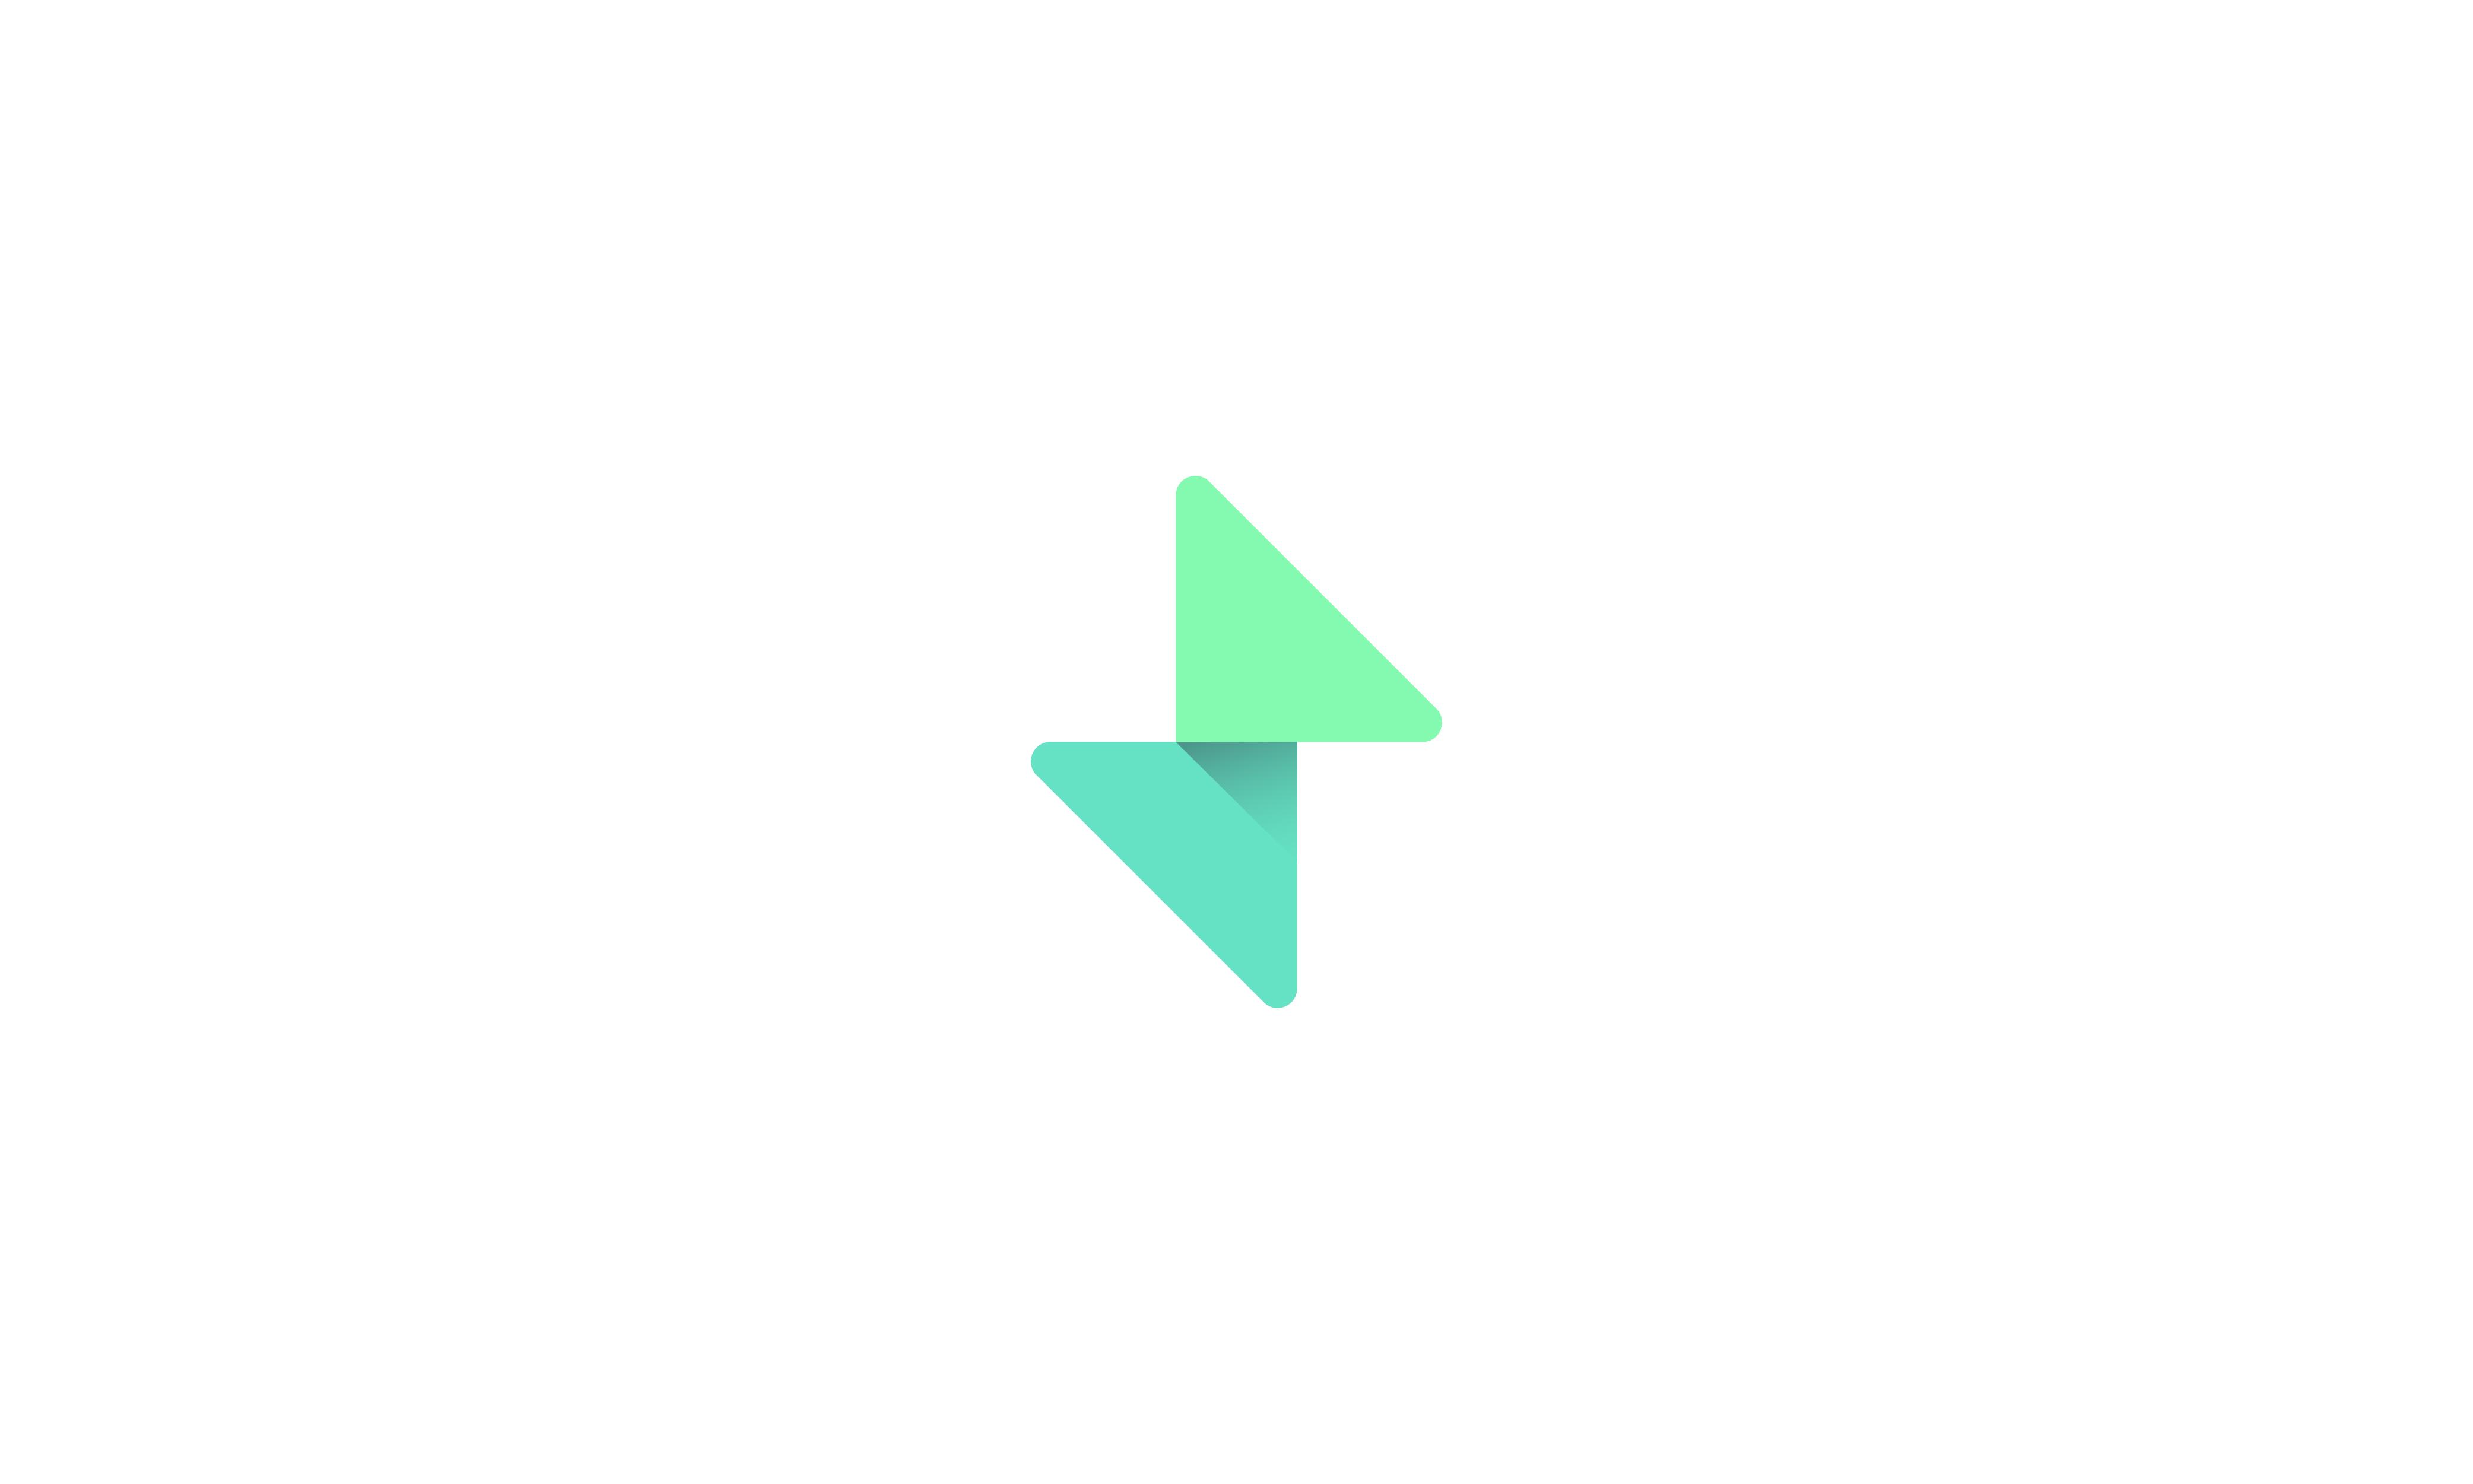 Срочно! Дизайн логотипа ООО «СЭТ» фото f_3685d4eb53748a55.jpg